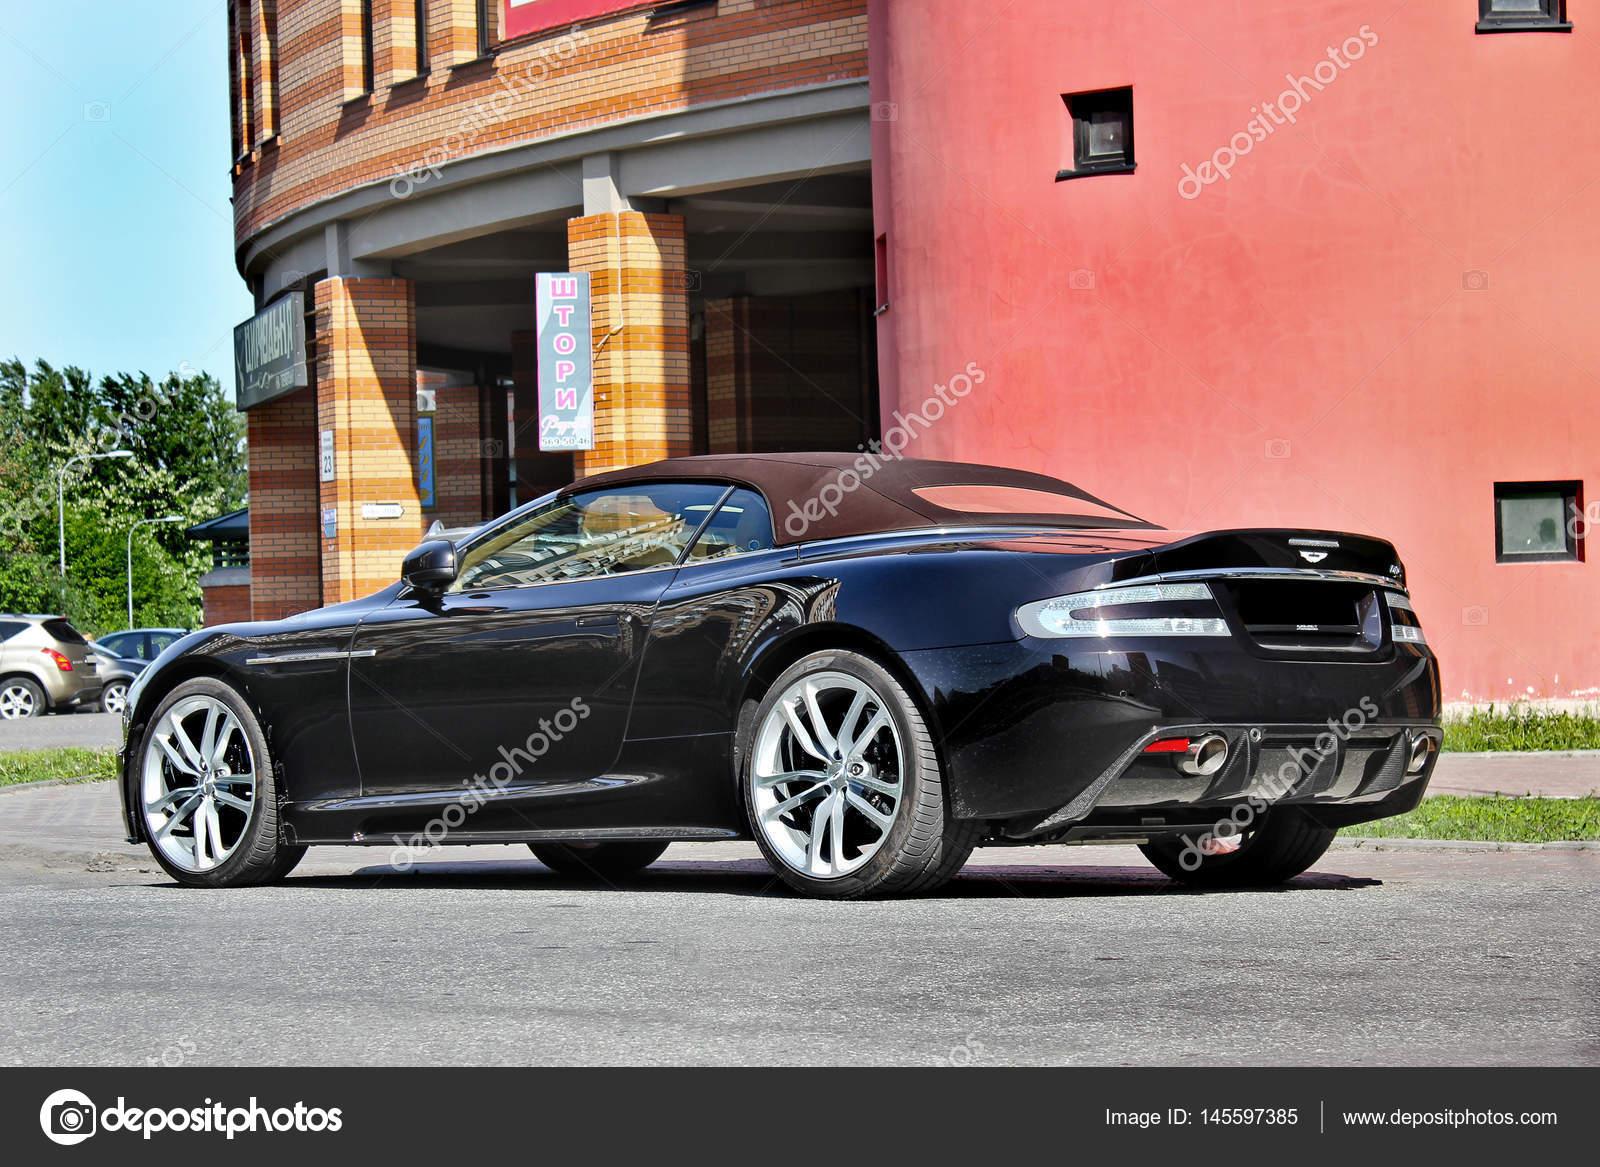 Kiev Ukraine September 20 2014 Aston Martin Dbs V12 Volante Cabriolet The Luxury Convertible The Color Of Chocolate Editorial Photo Stock Editorial Photo Amor7 145597385